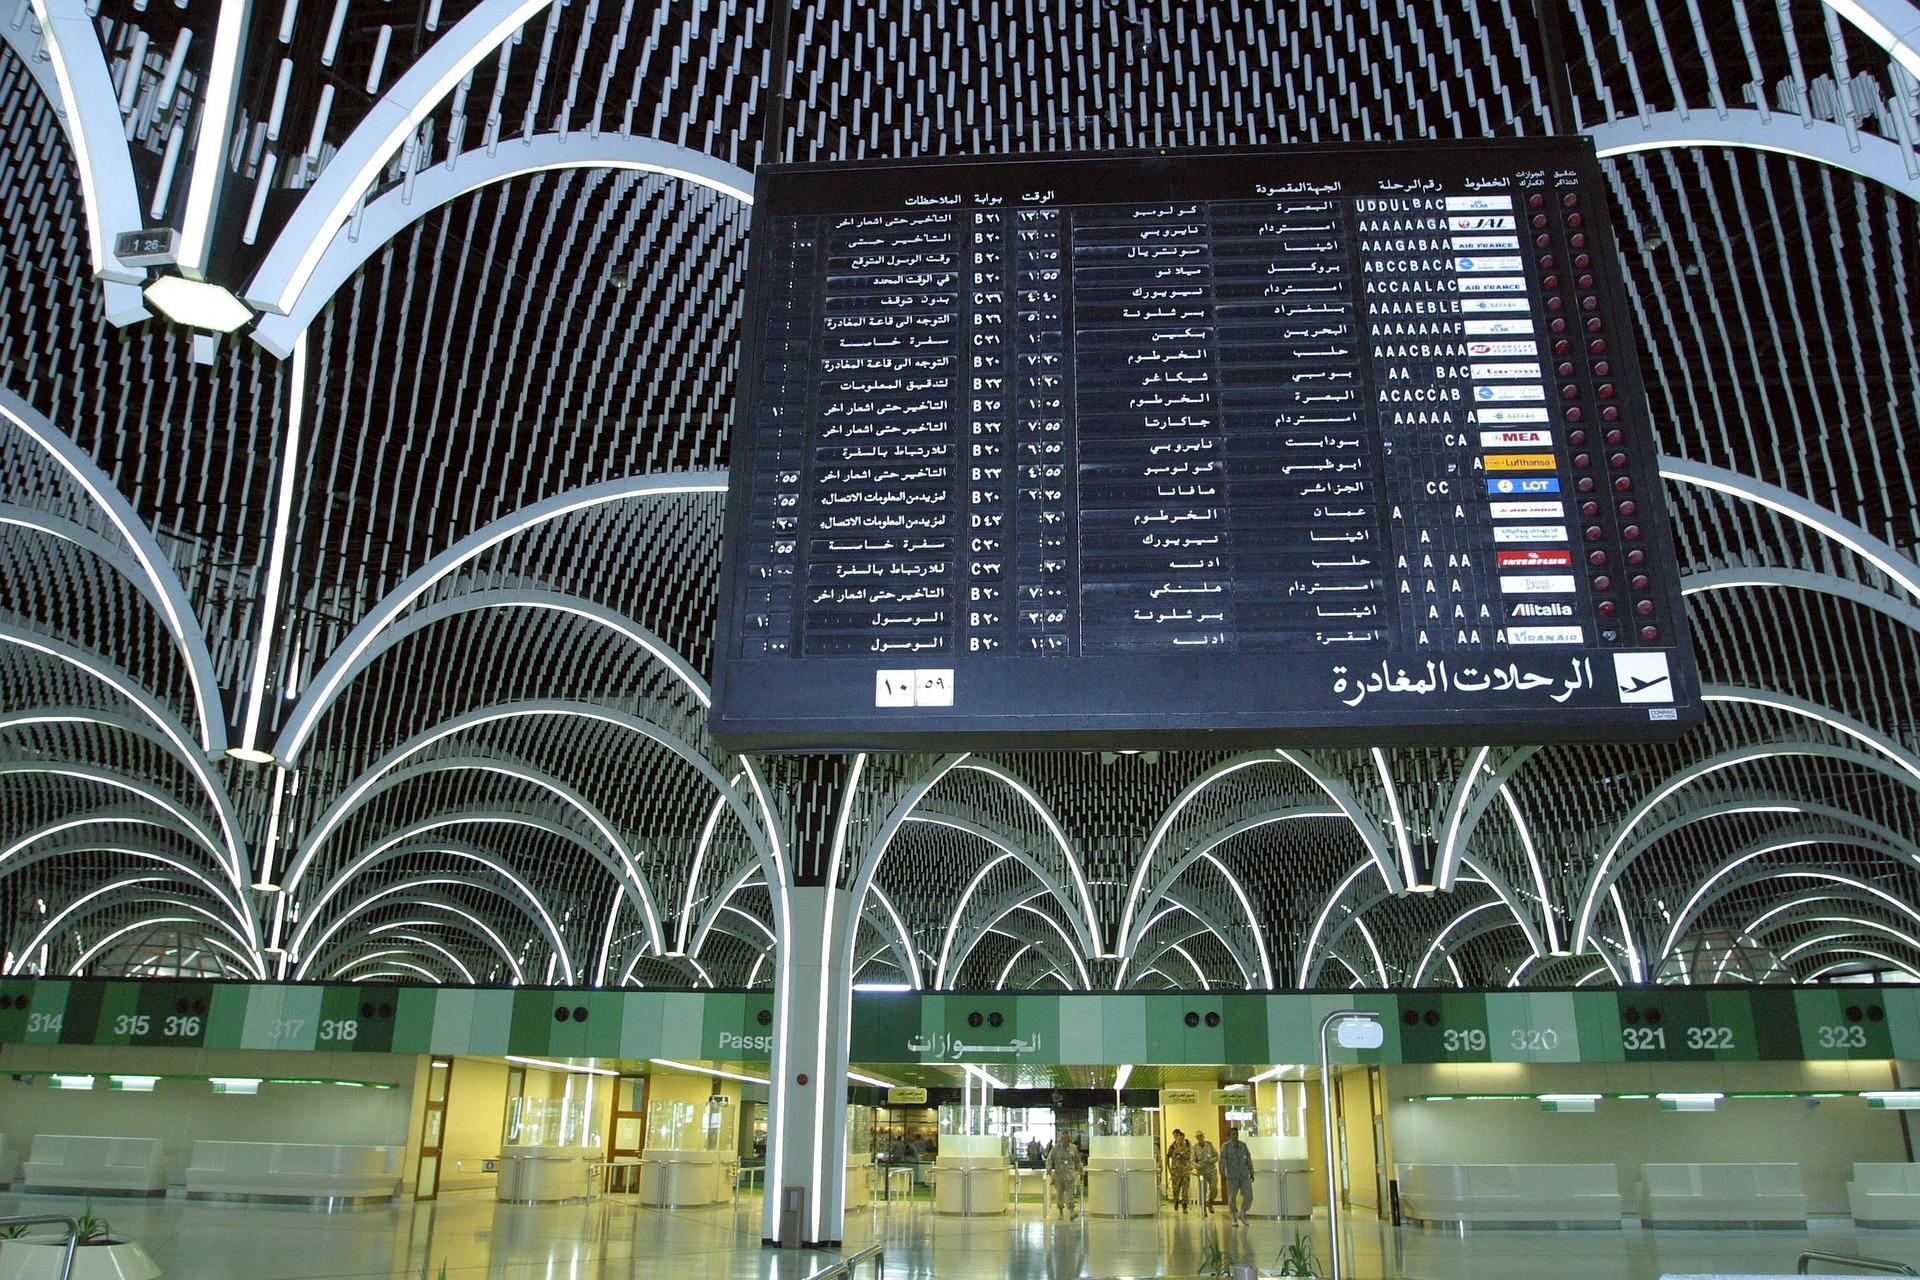 Flughafen Bagdad